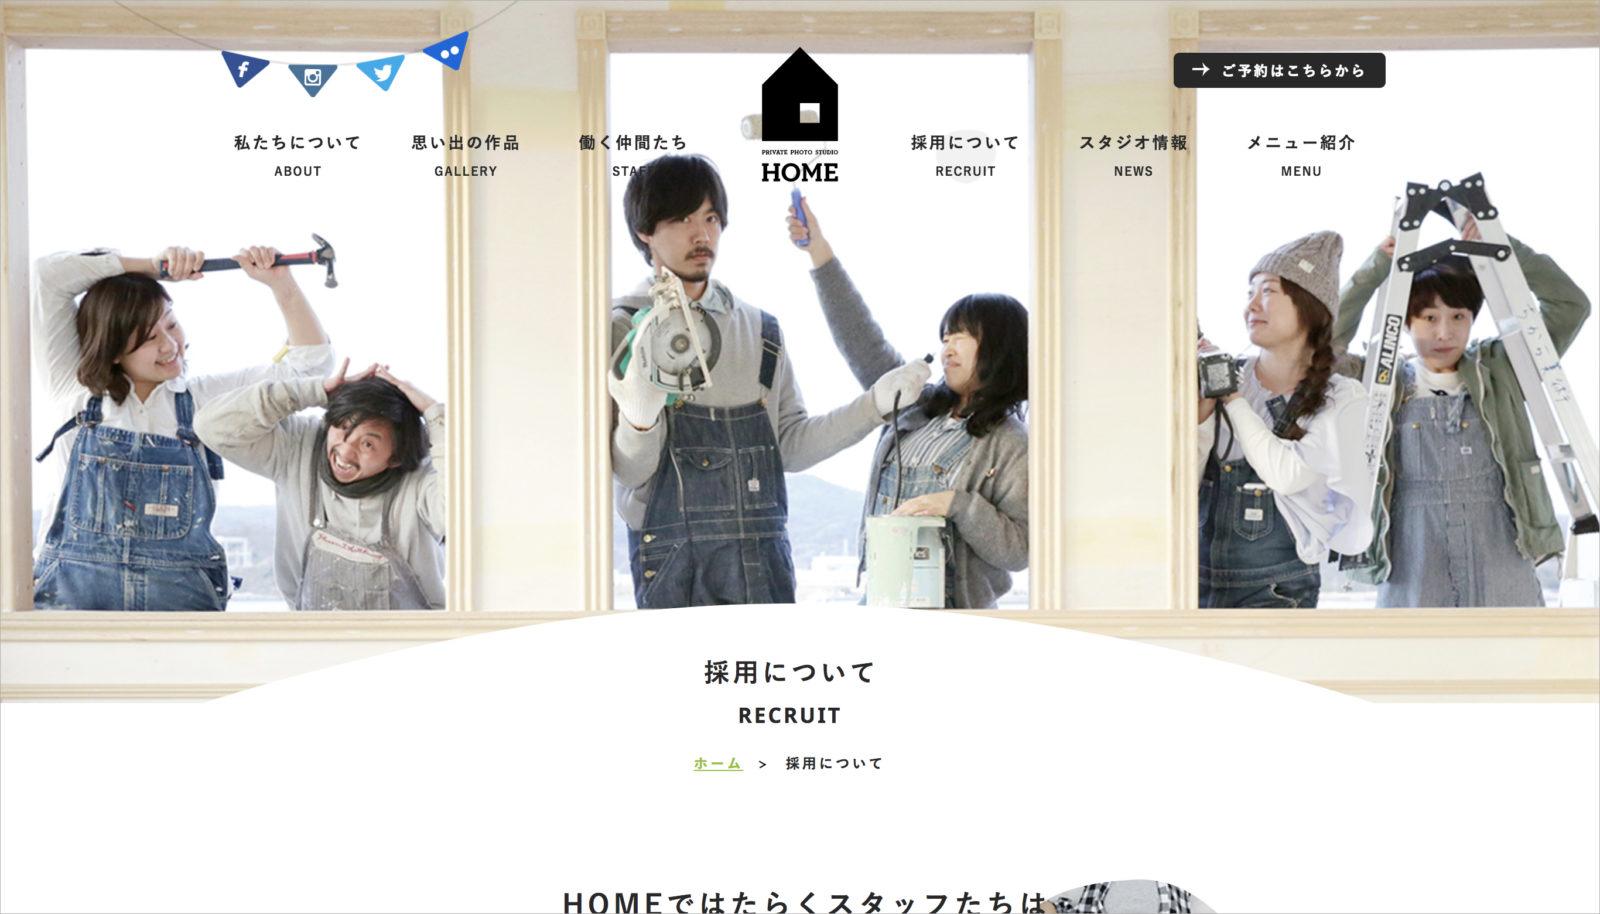 『Private Photo Studio HOME』 / コーポレートサイト制作